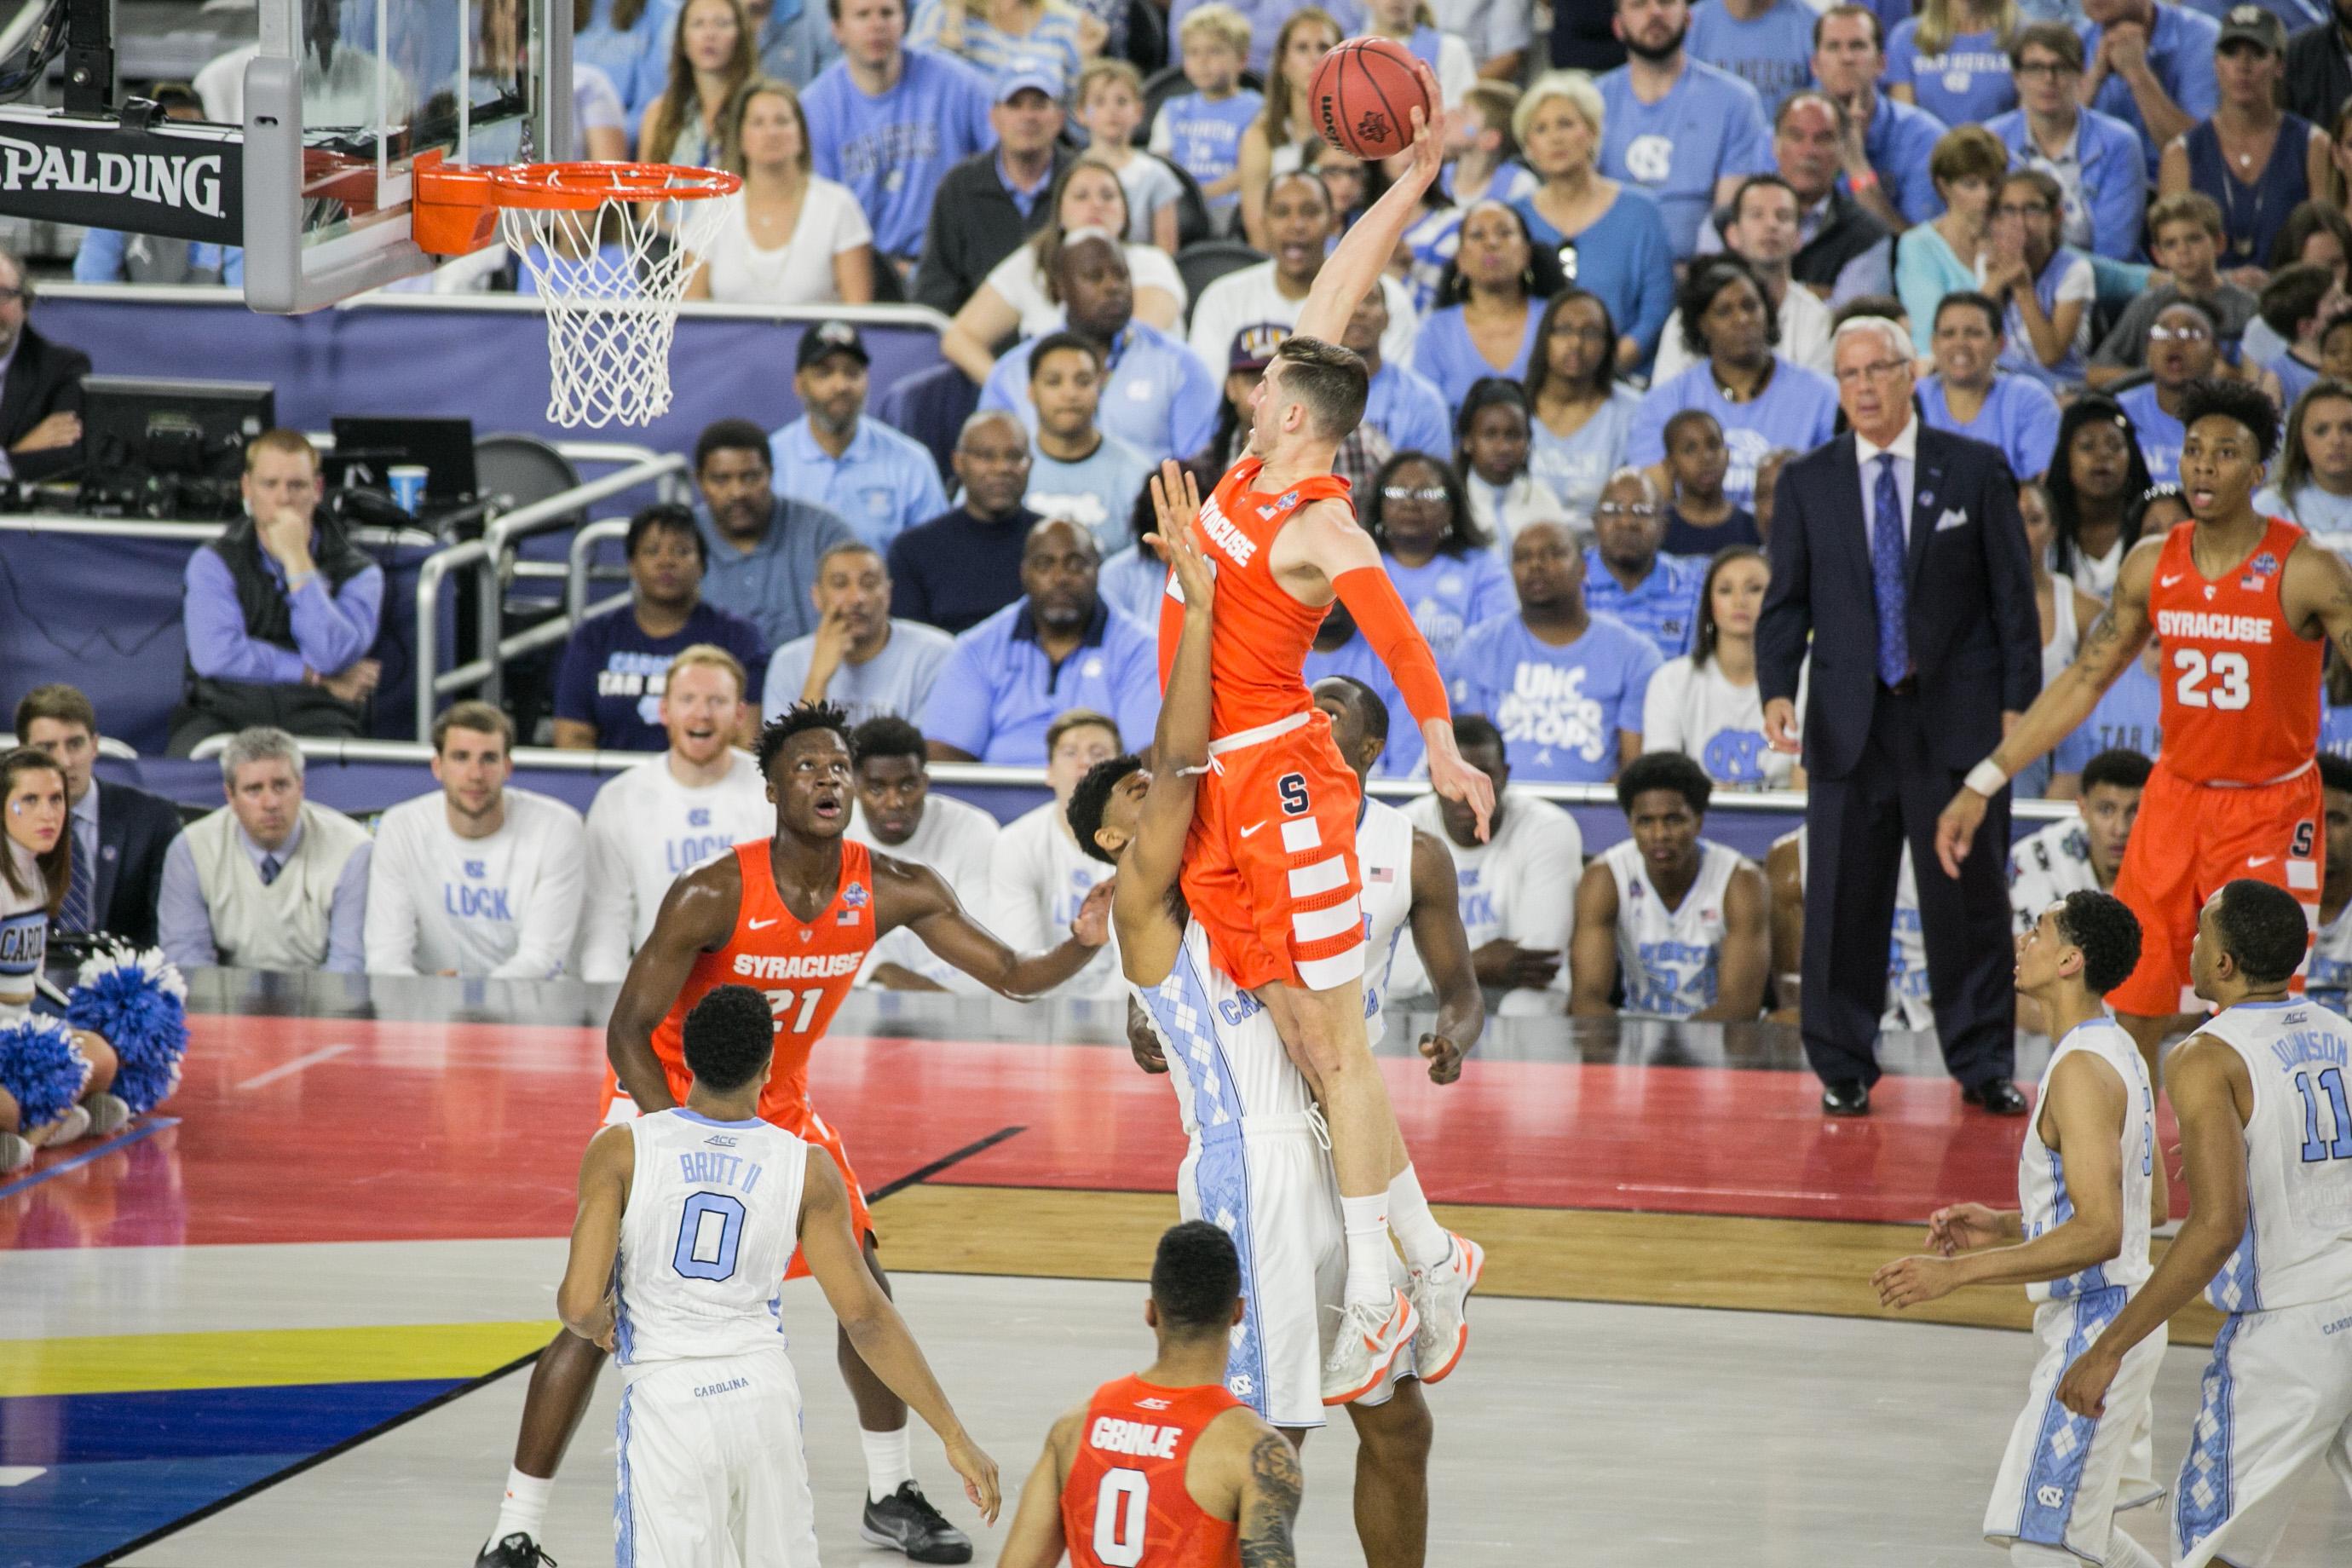 Ncaa Final Four 10 Syracuse Vs 1 North Carolina Photo Gallery